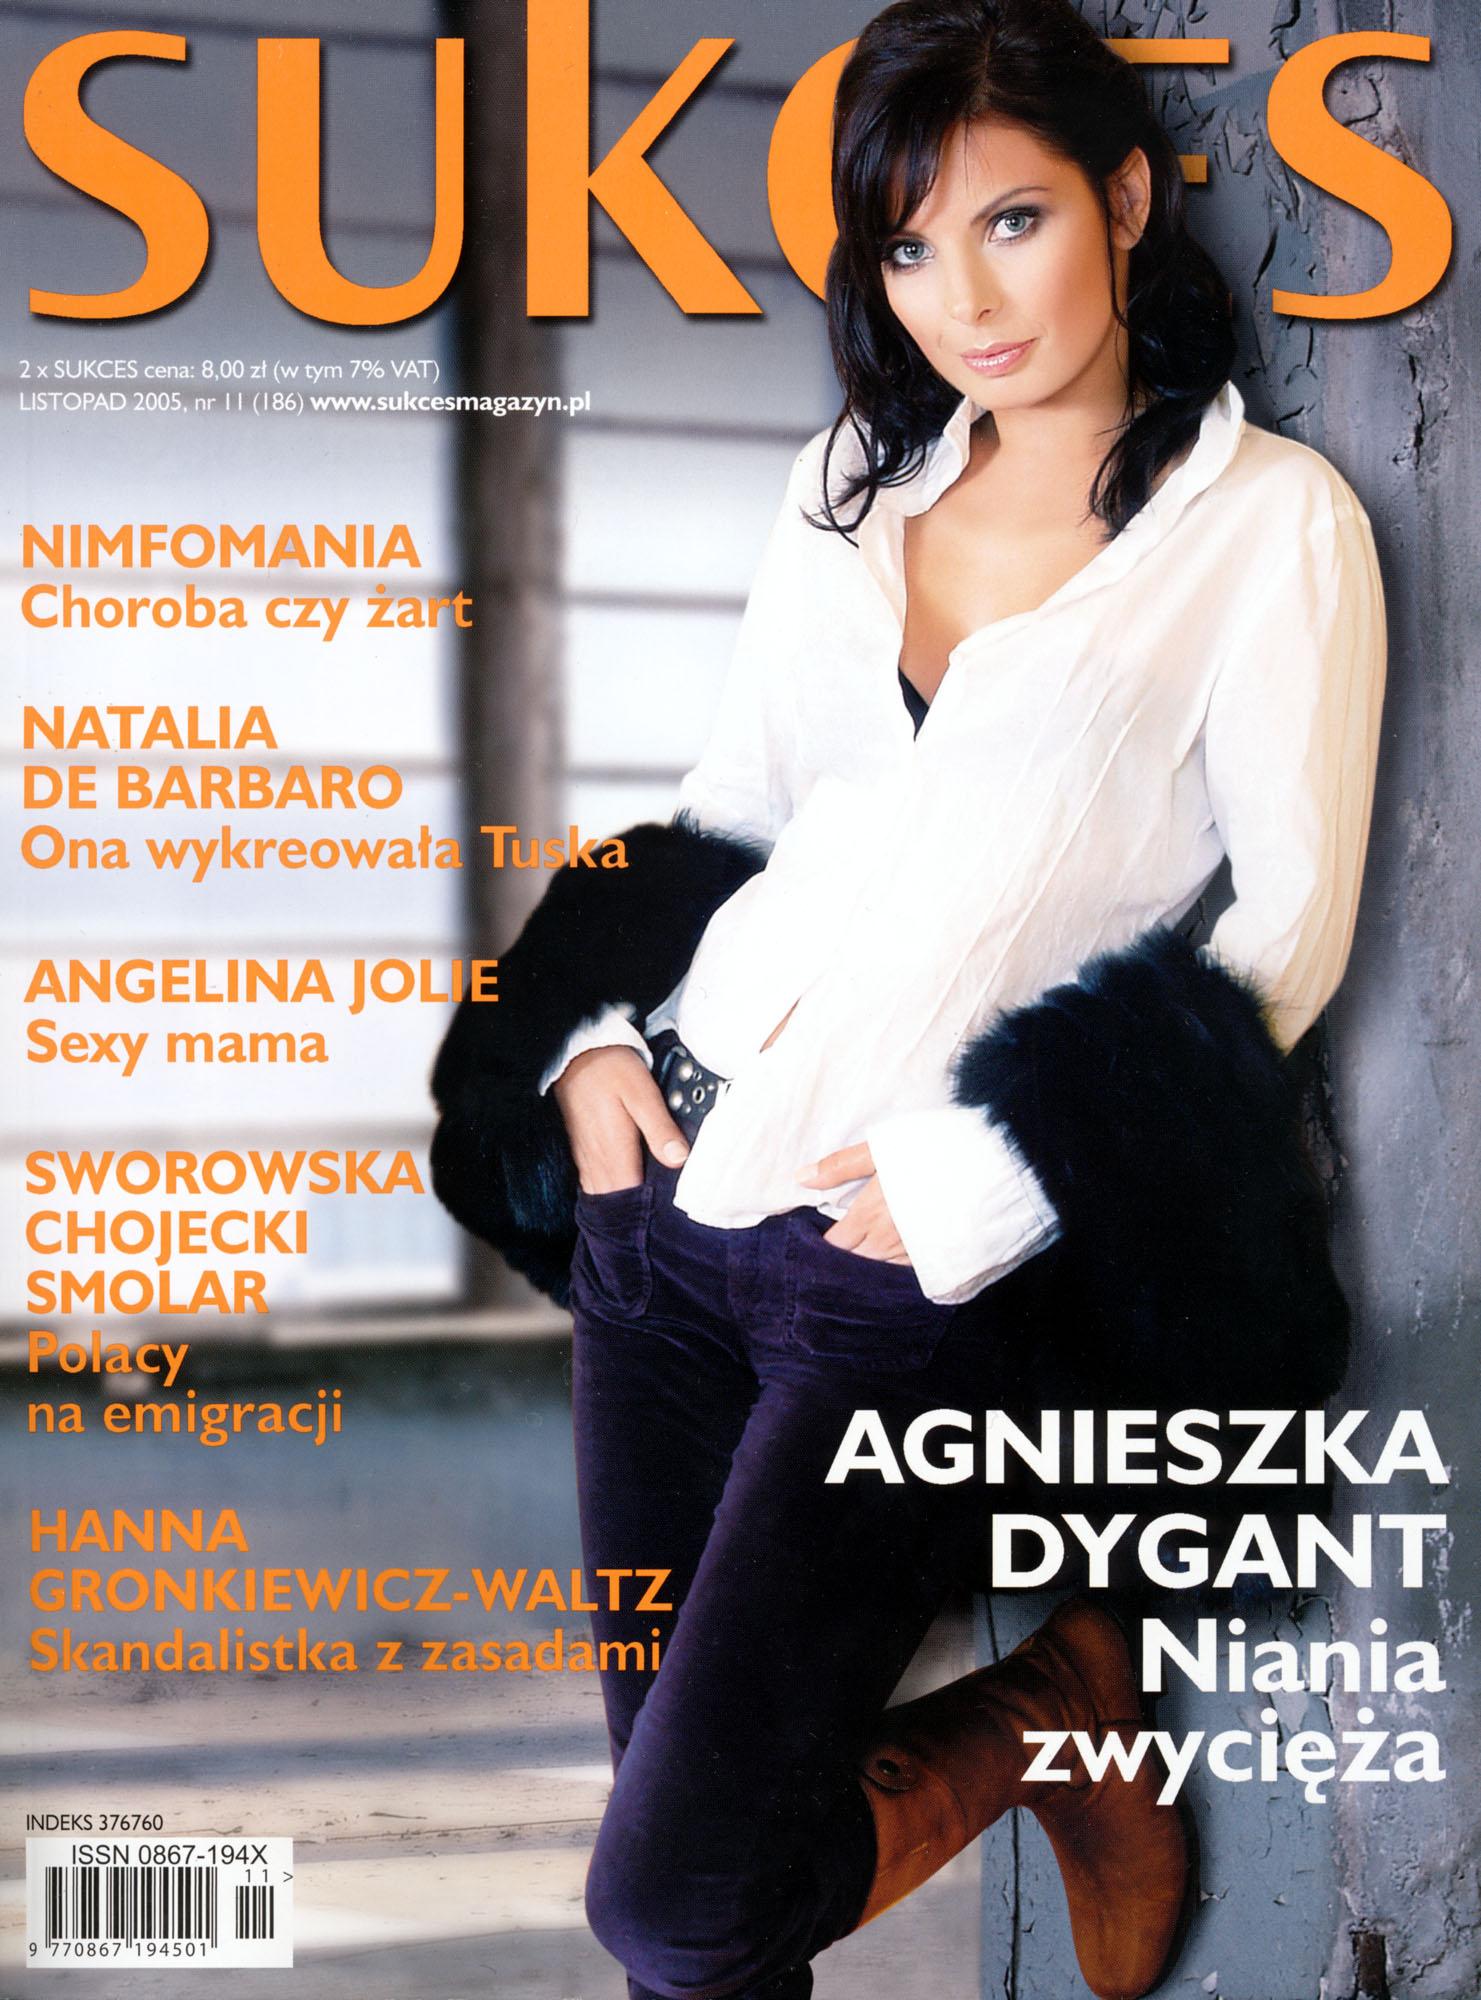 Dygant agnieszka Agnieszka Dygant